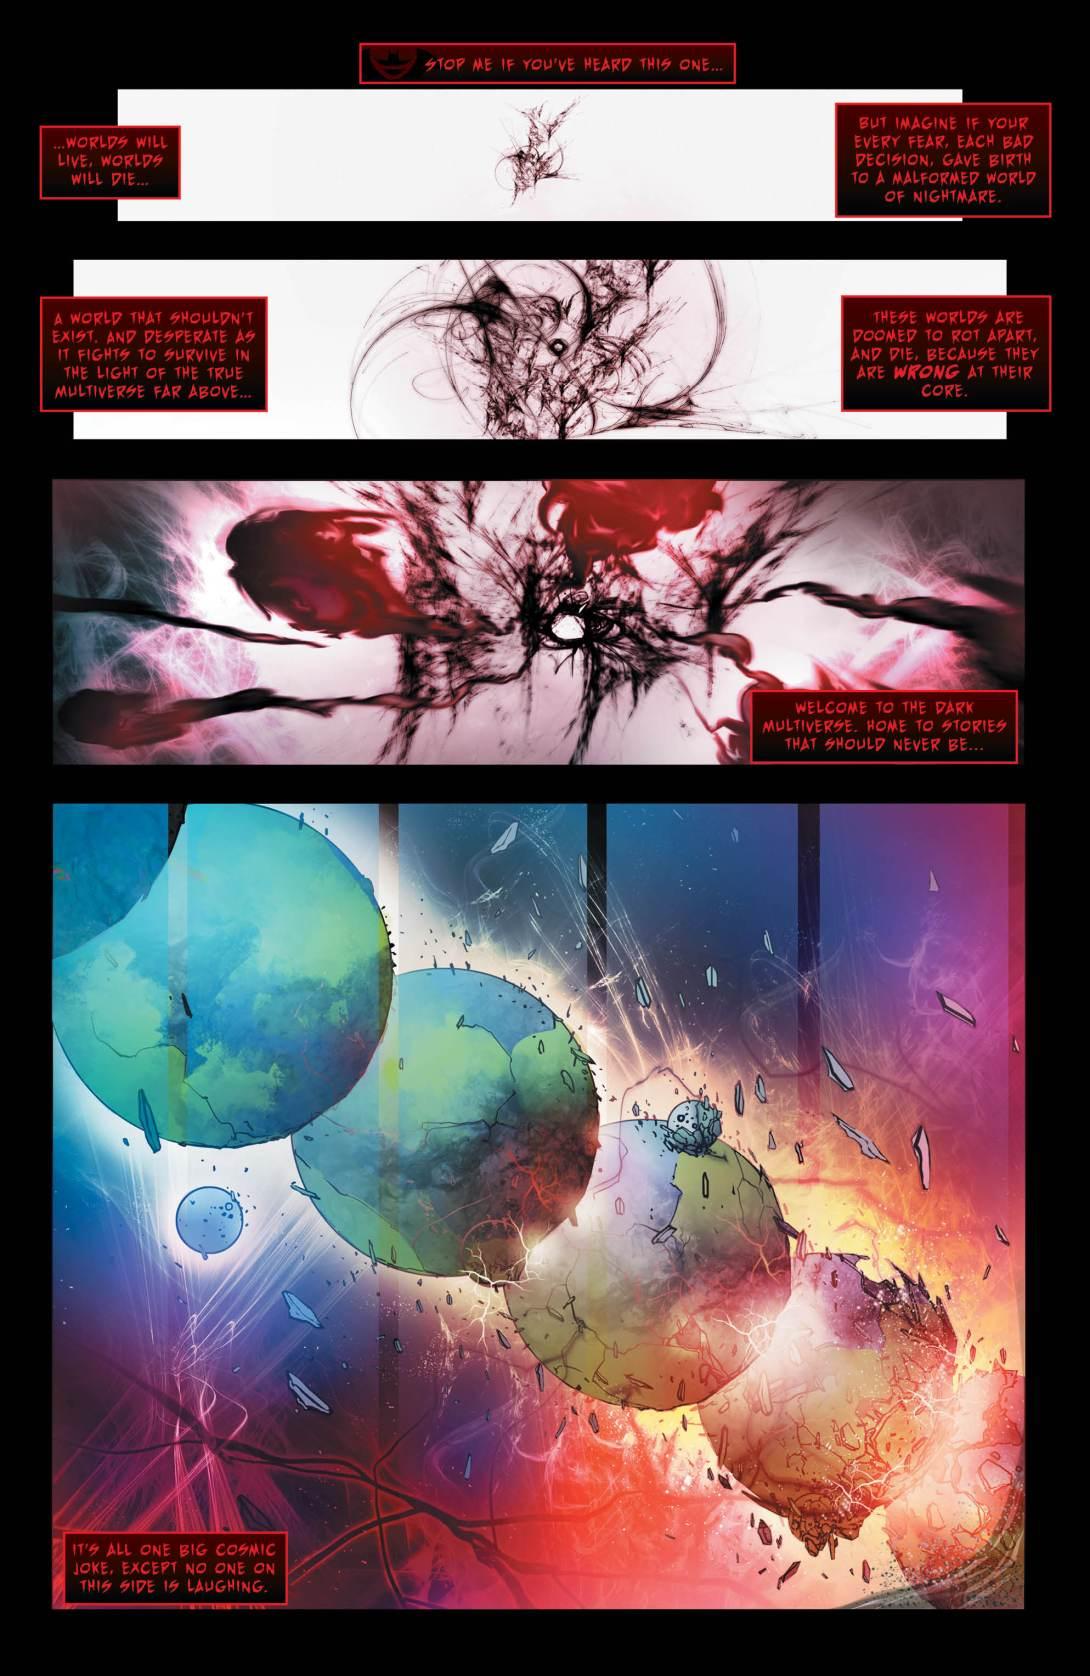 Red Death 1 - DC Comics News